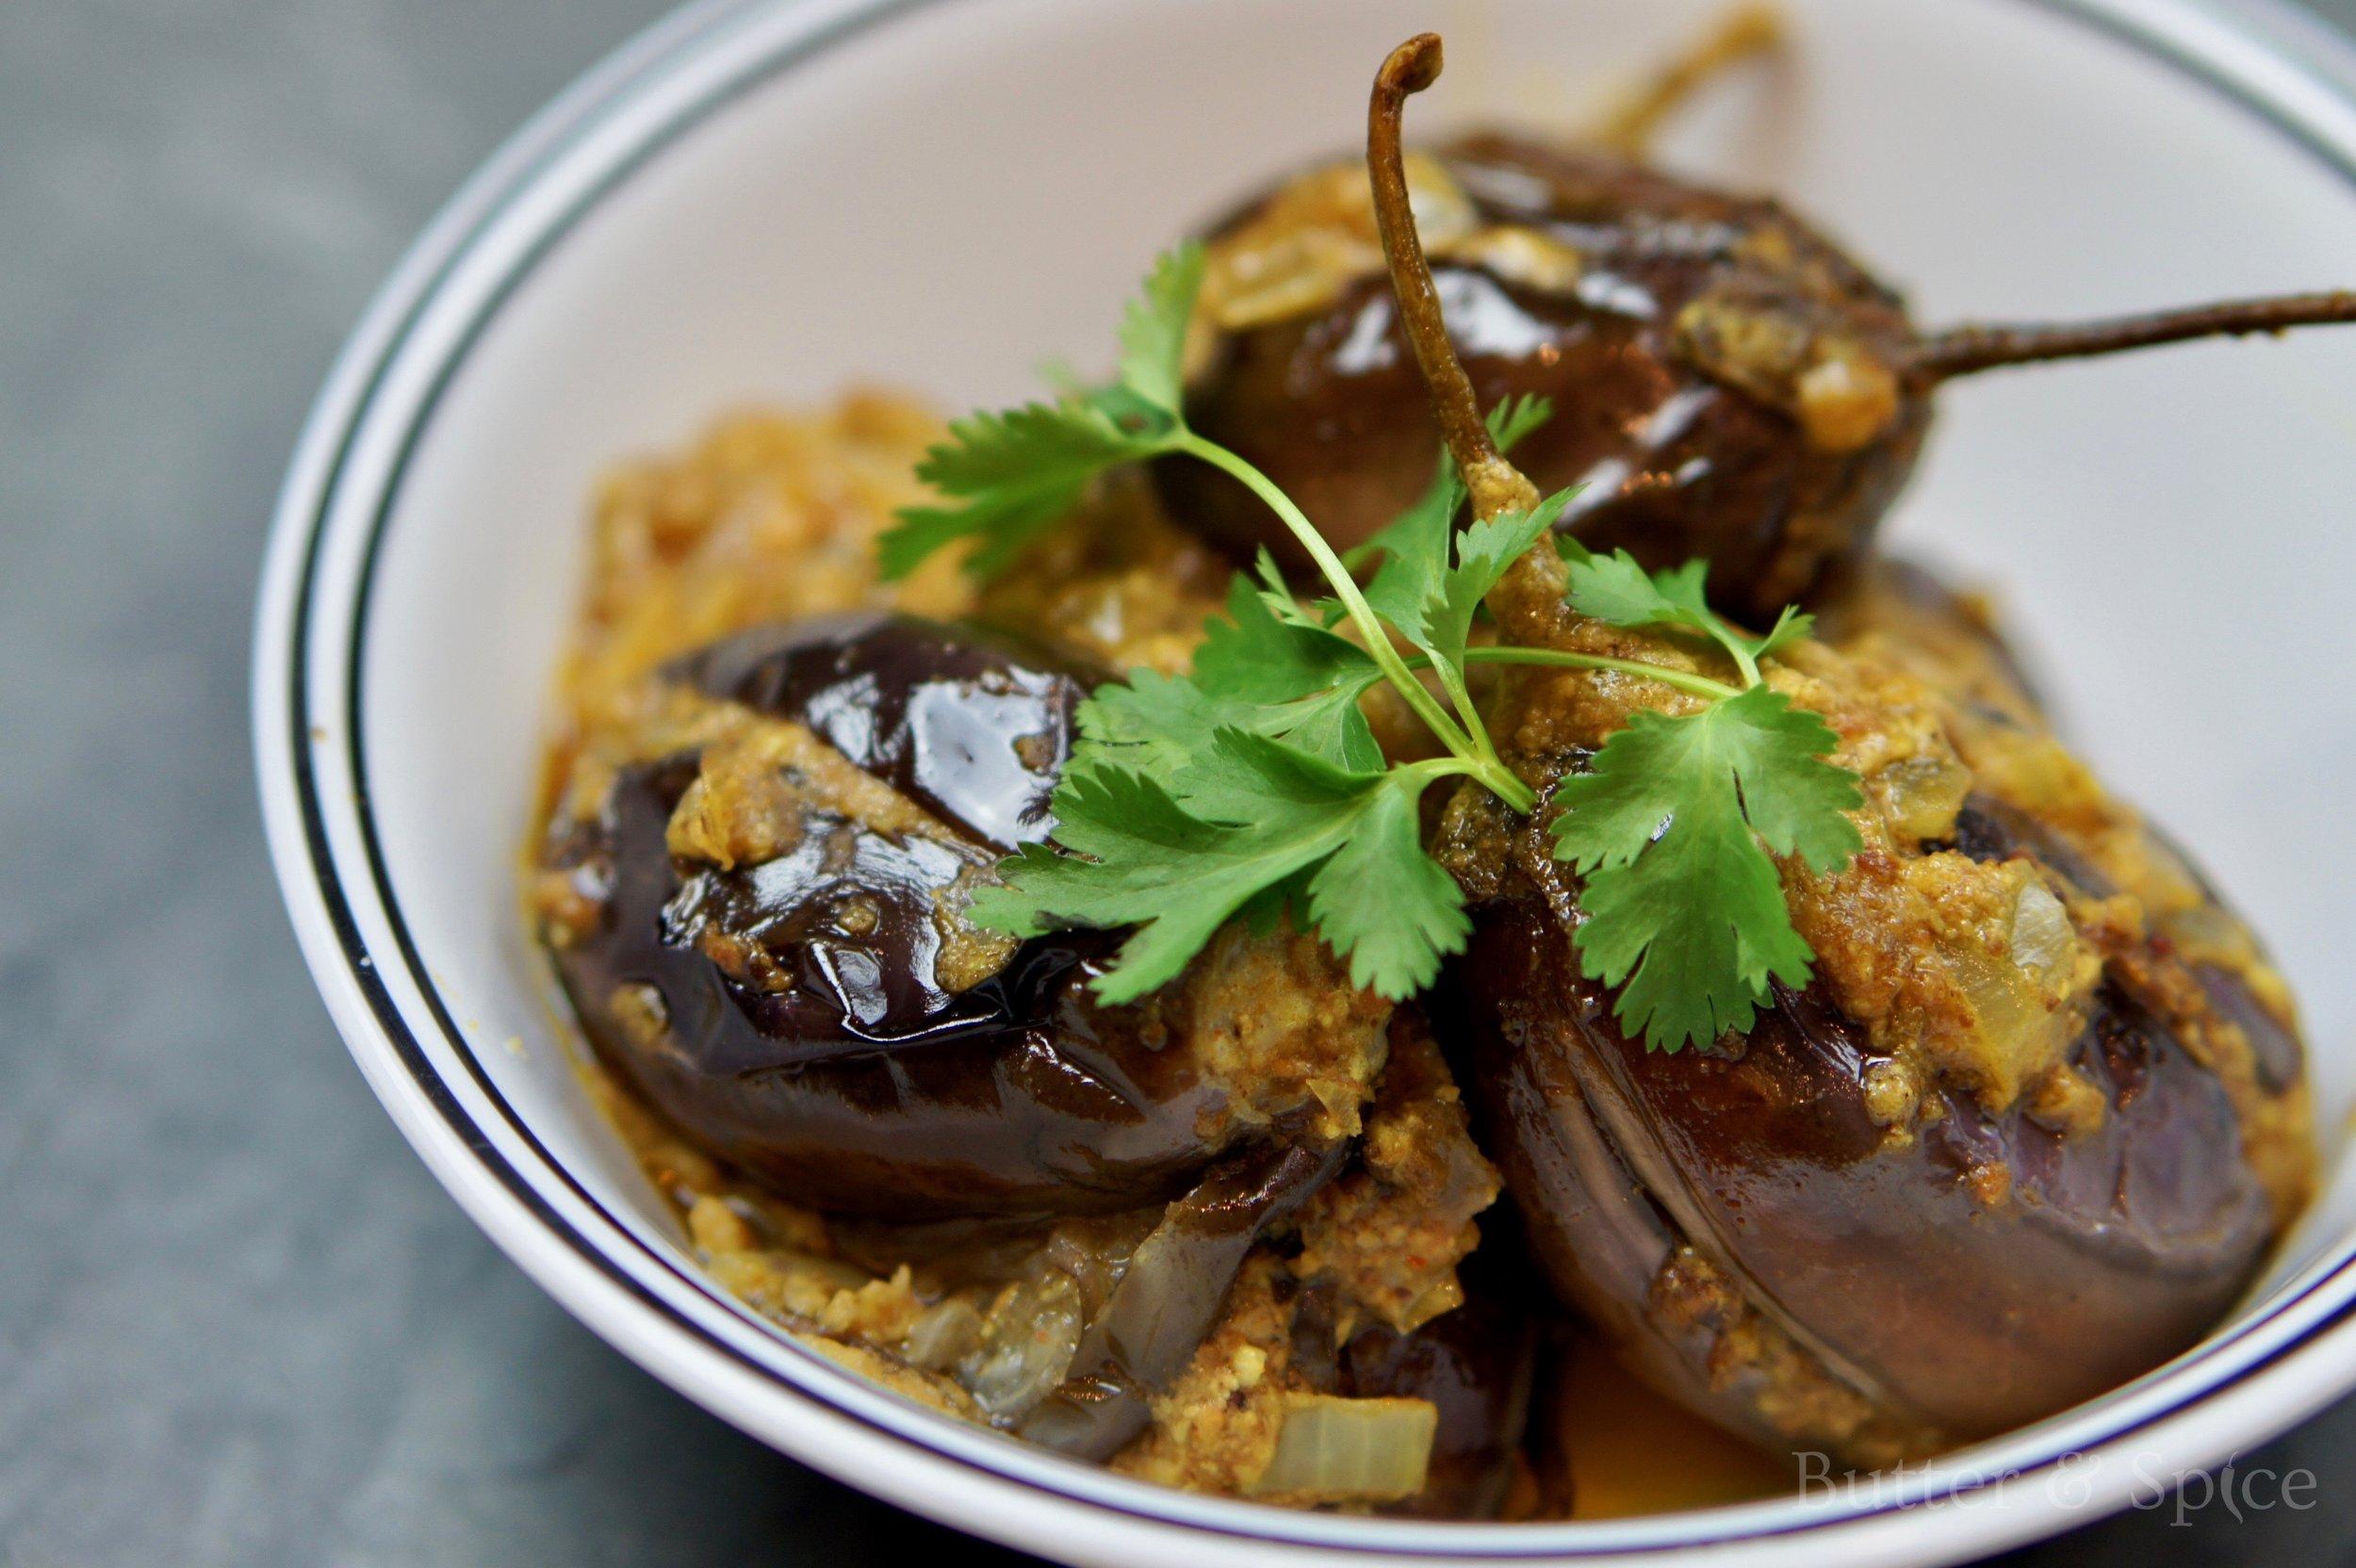 Low Carb Indian Stuffed Eggplants